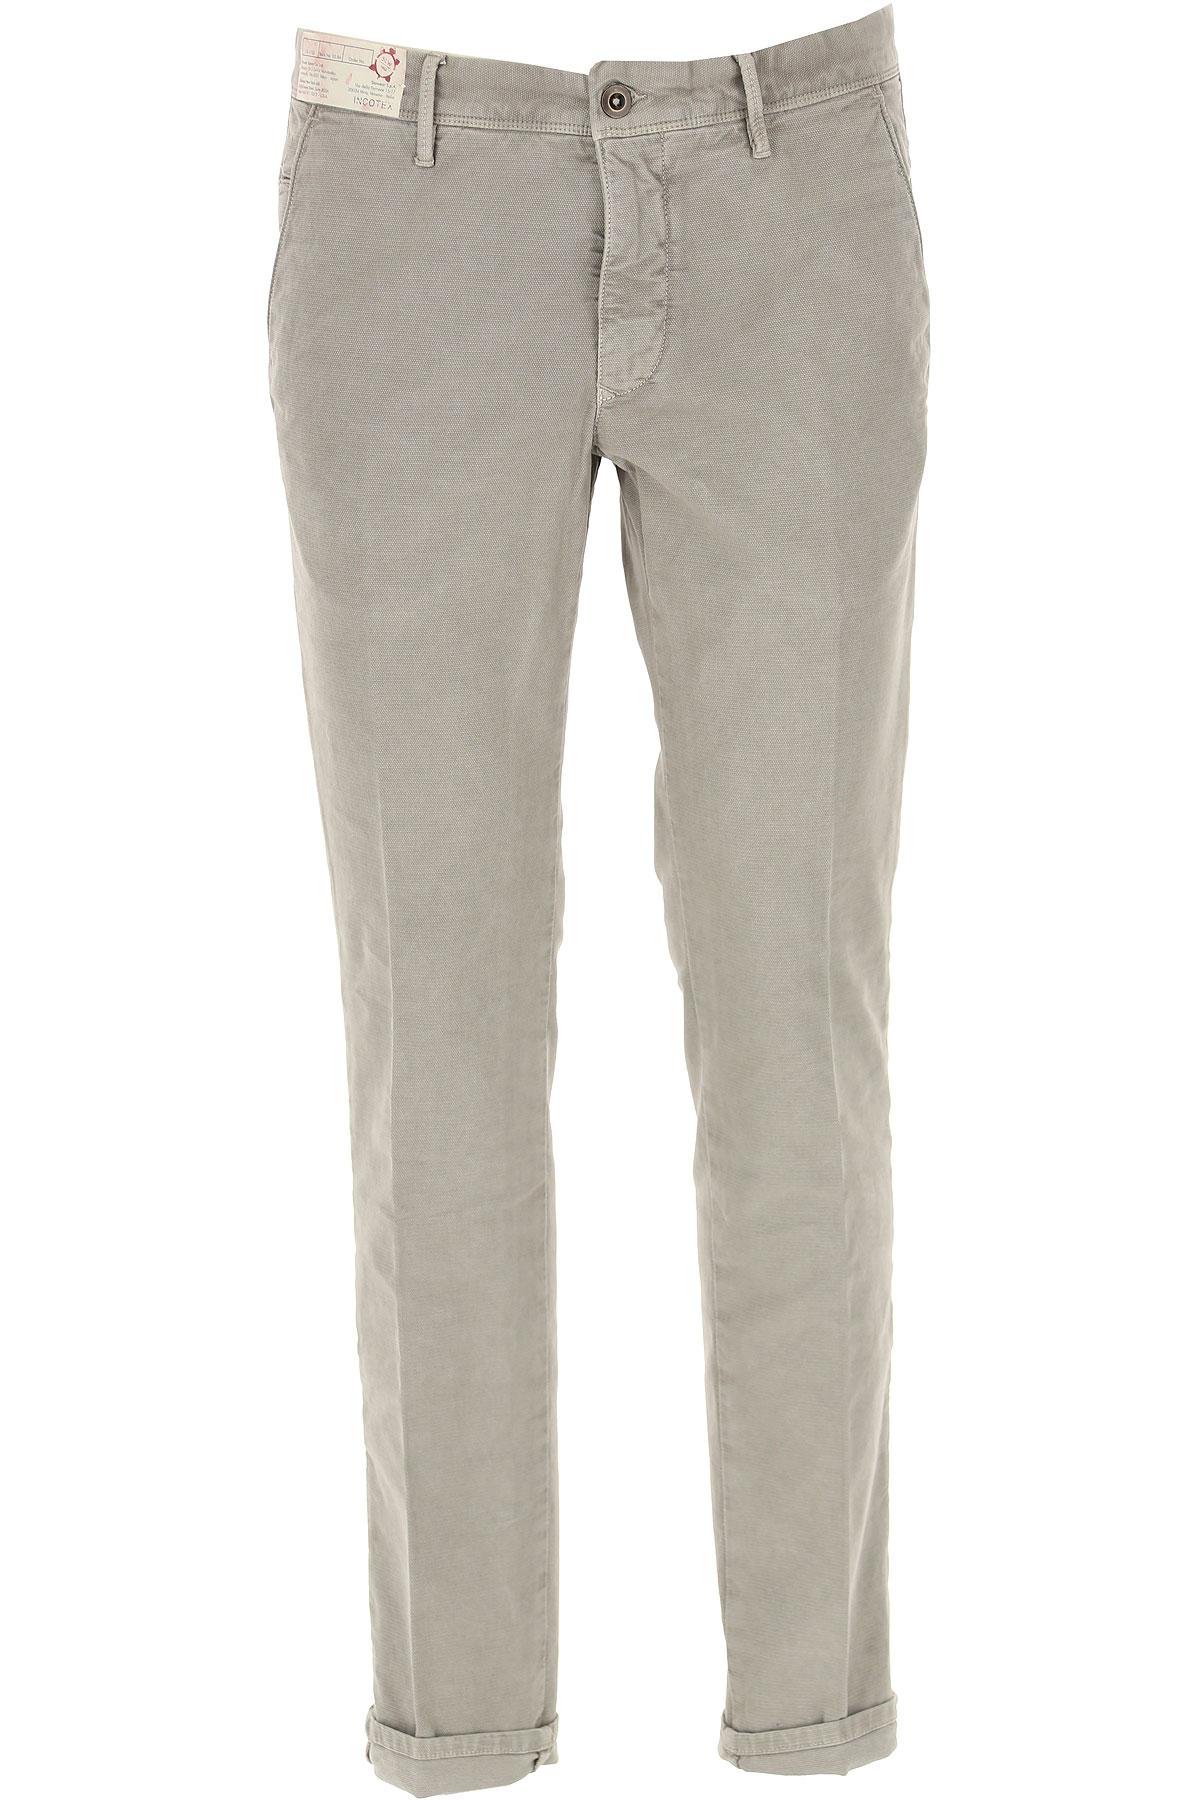 Incotex Pants for Men On Sale, Grey, Cotton, 2019, 33 34 35 36